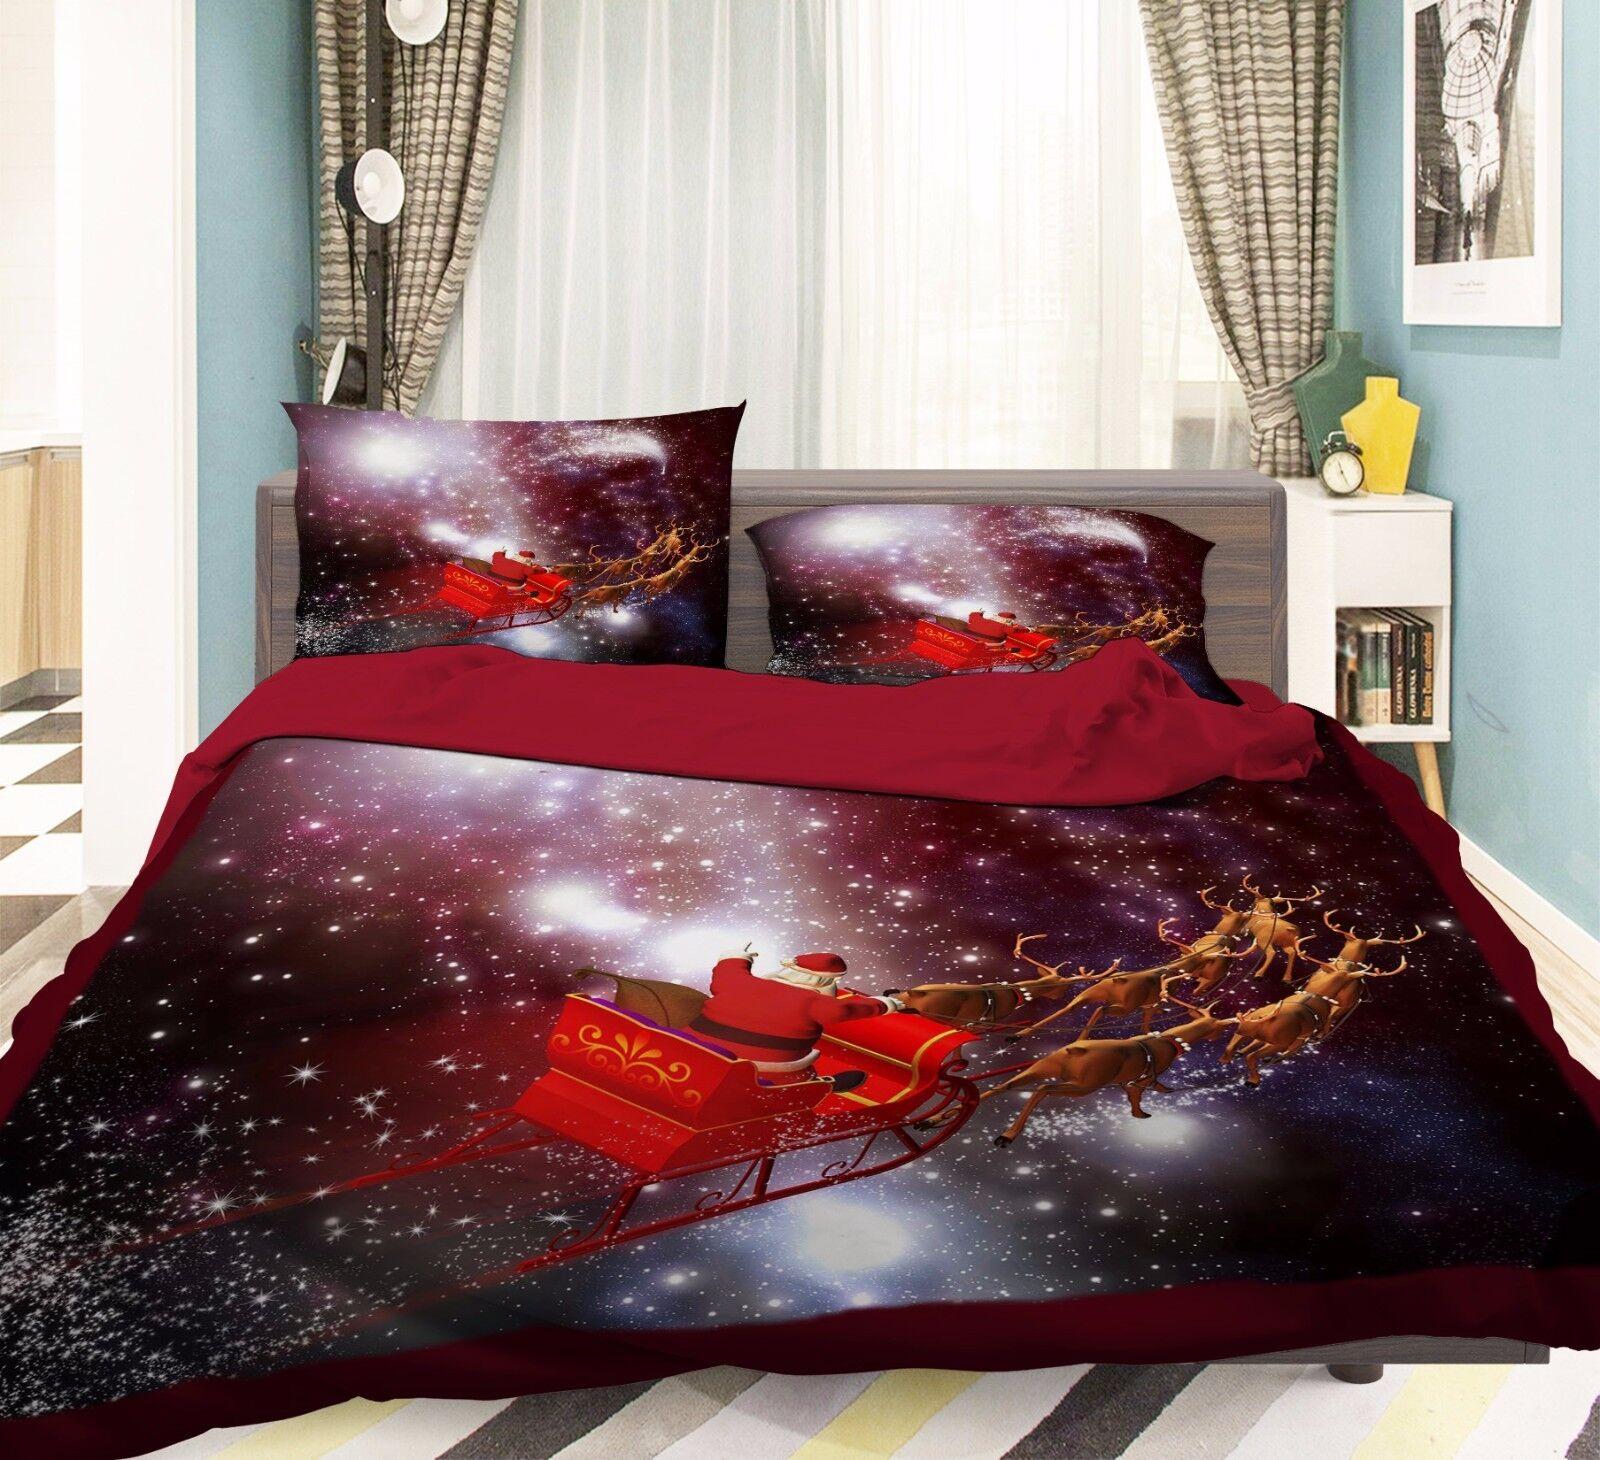 3D Snow Xmas 755 Bed Pillowcases Quilt Duvet Cover Set Single Queen UK Summer